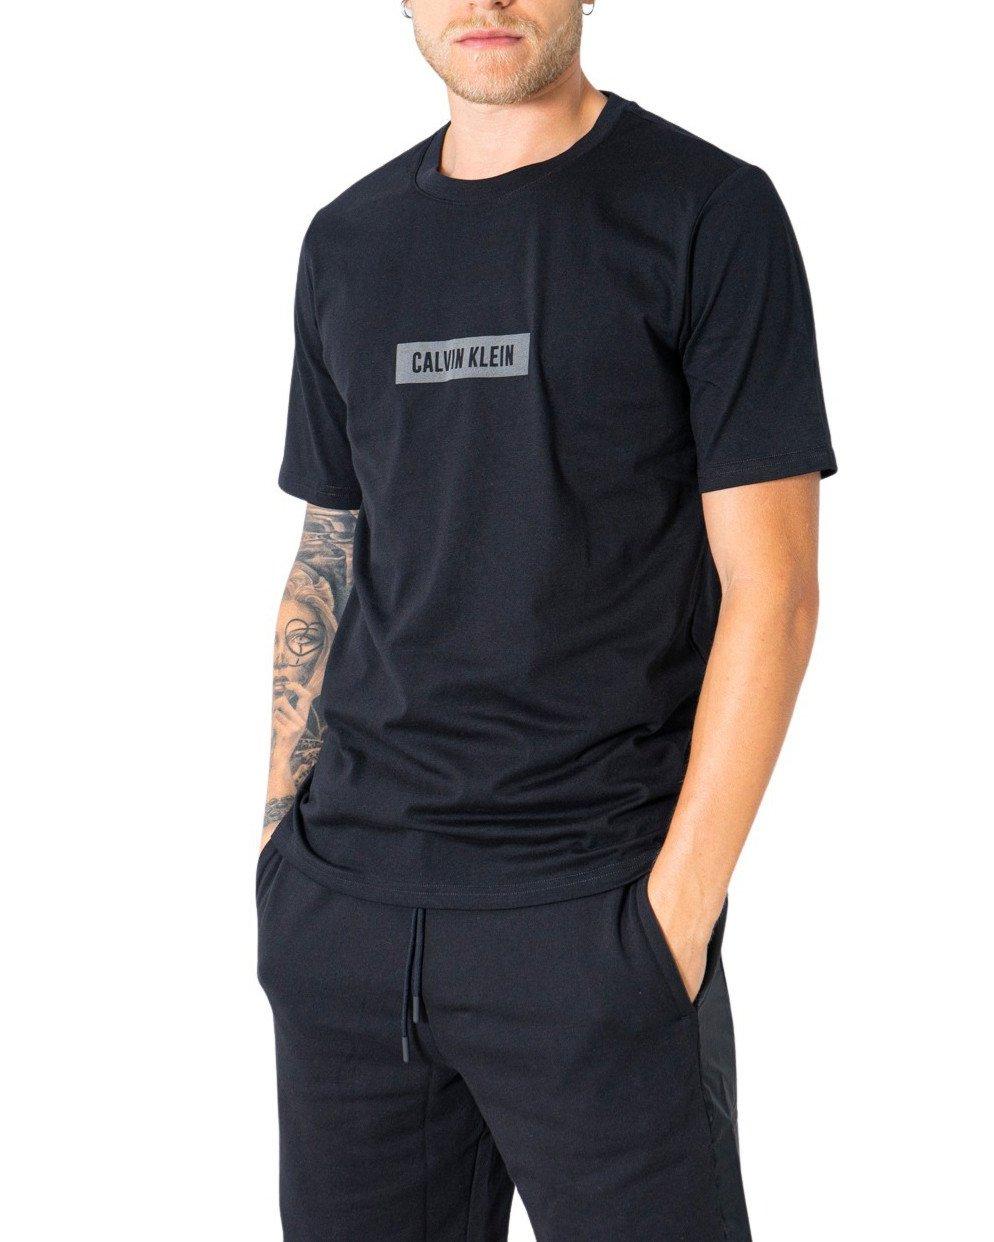 Calvin Klein Performance Women's T-Shirt Various Colours 305919 - black-2 S